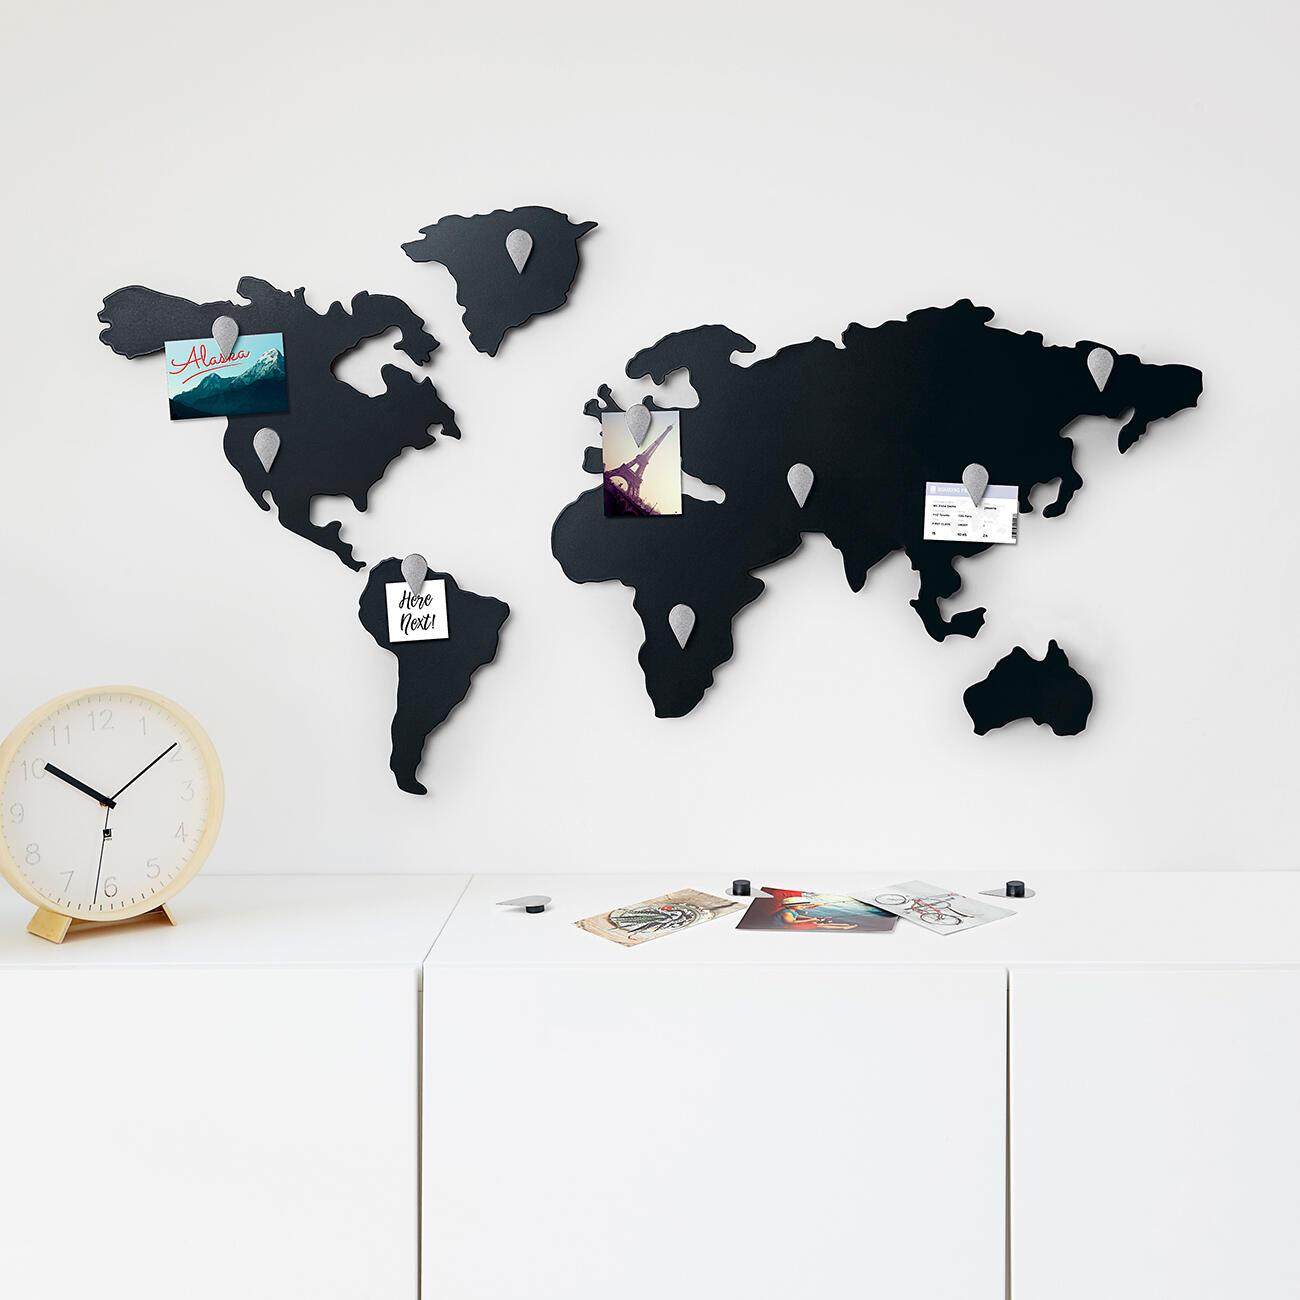 umbra pinnwand magnettafel wanddekoration mappit titanium schwarz. Black Bedroom Furniture Sets. Home Design Ideas